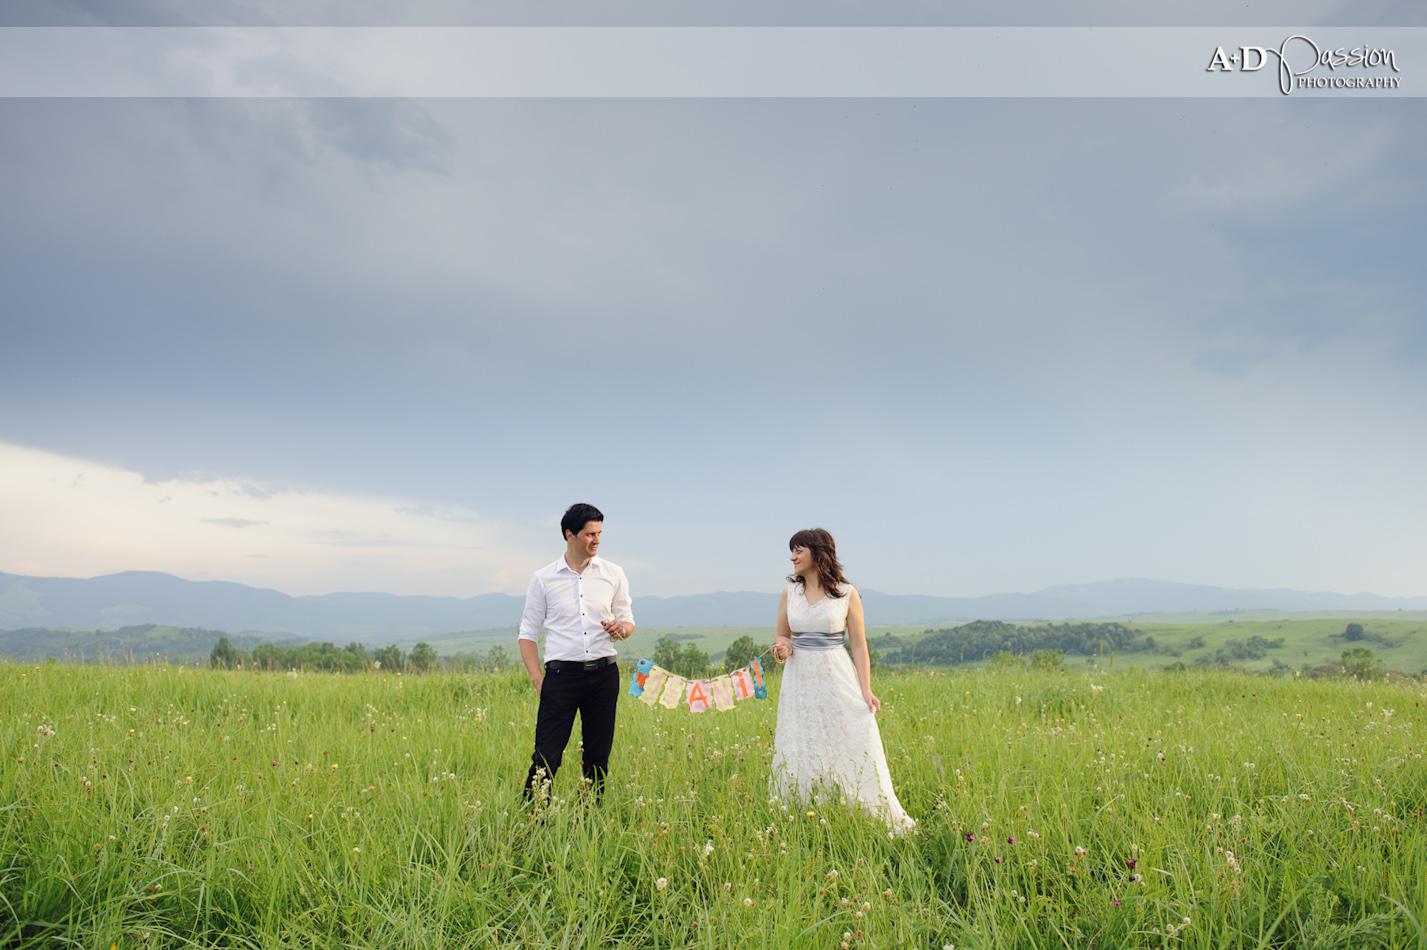 AD Passion Photography | 07042012_fotograf-profesionist-nunta_after-wedding_carmen-si-costi_0047 | Adelin, Dida, fotograf profesionist, fotograf de nunta, fotografie de nunta, fotograf Timisoara, fotograf Craiova, fotograf Bucuresti, fotograf Arad, nunta Timisoara, nunta Arad, nunta Bucuresti, nunta Craiova